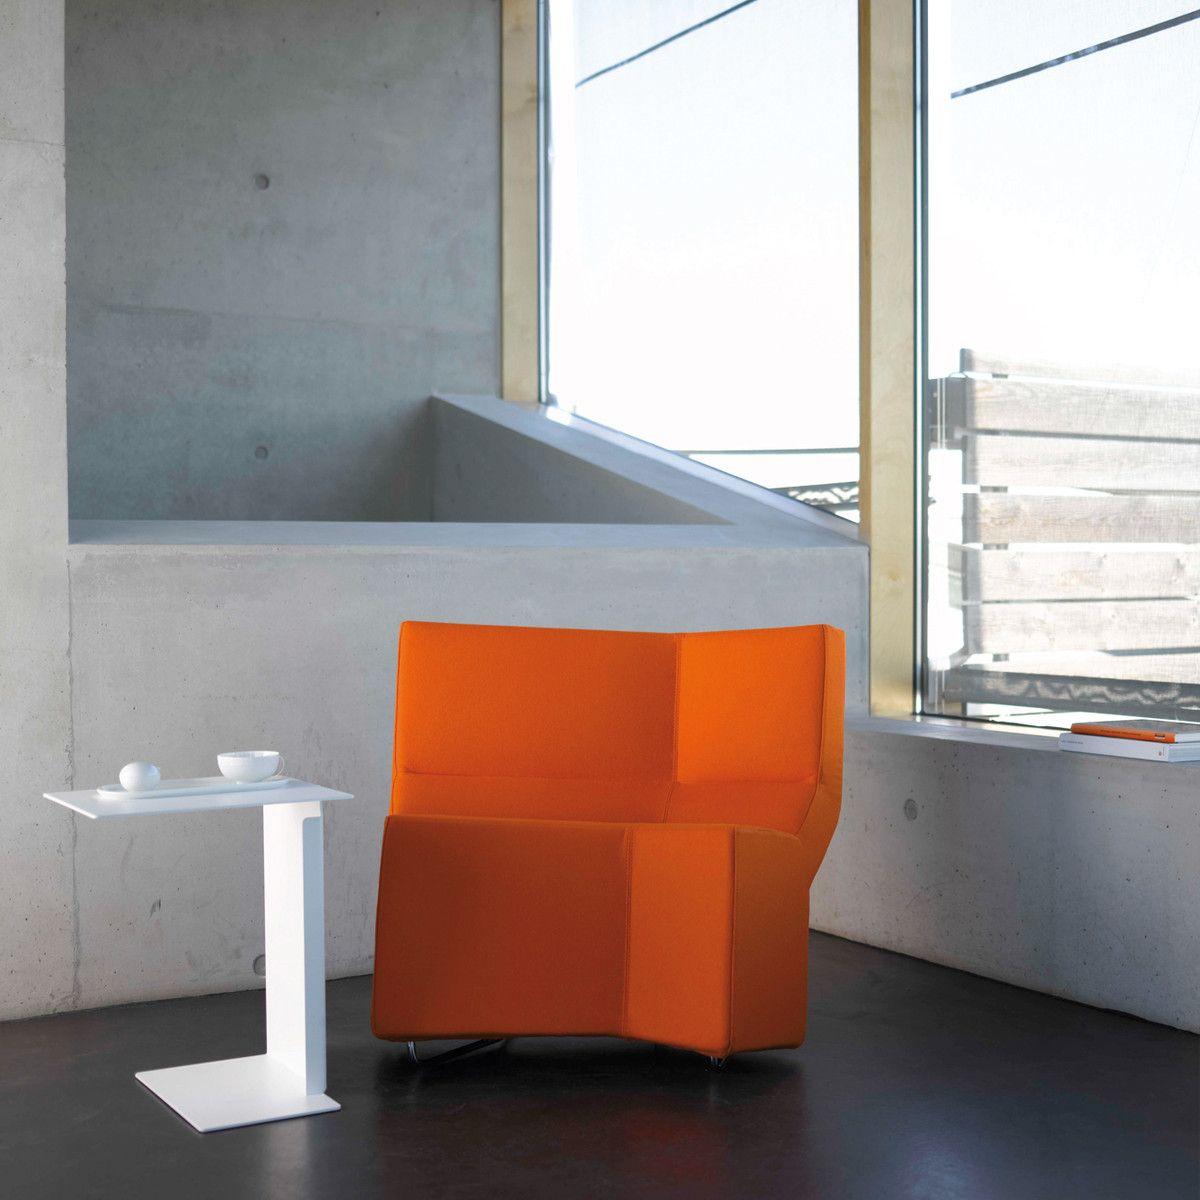 ClassiCon - Diana B, side table, connox.com, €390 hxdxl:53x43x47cm